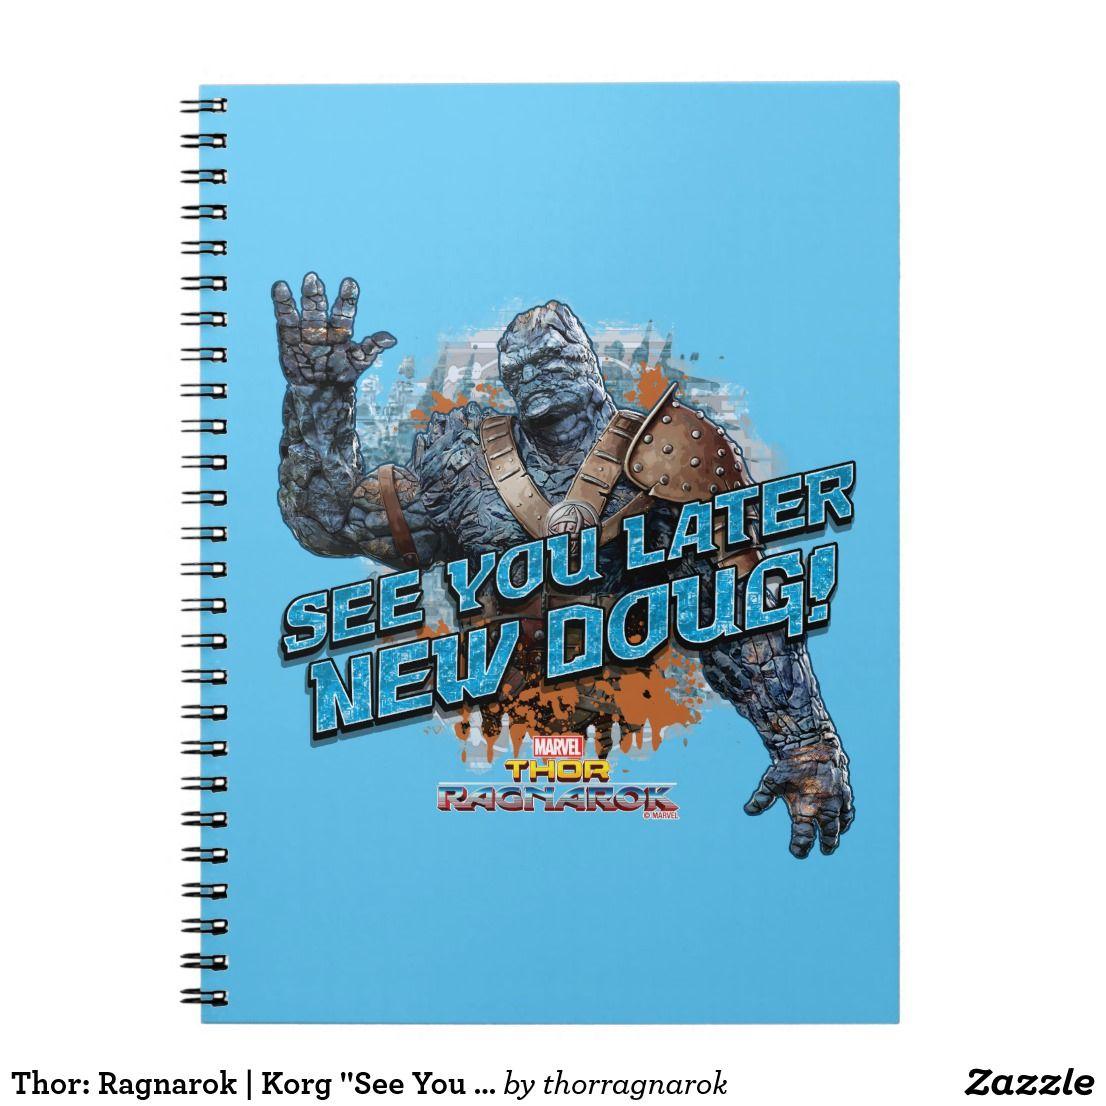 Thor Ragnarok Korg See You Later New Doug Notebook Must Have Awesome Marvel Items Thor Marvel Marvelcomics Comics Personalize Thor Korg Marvel Thor